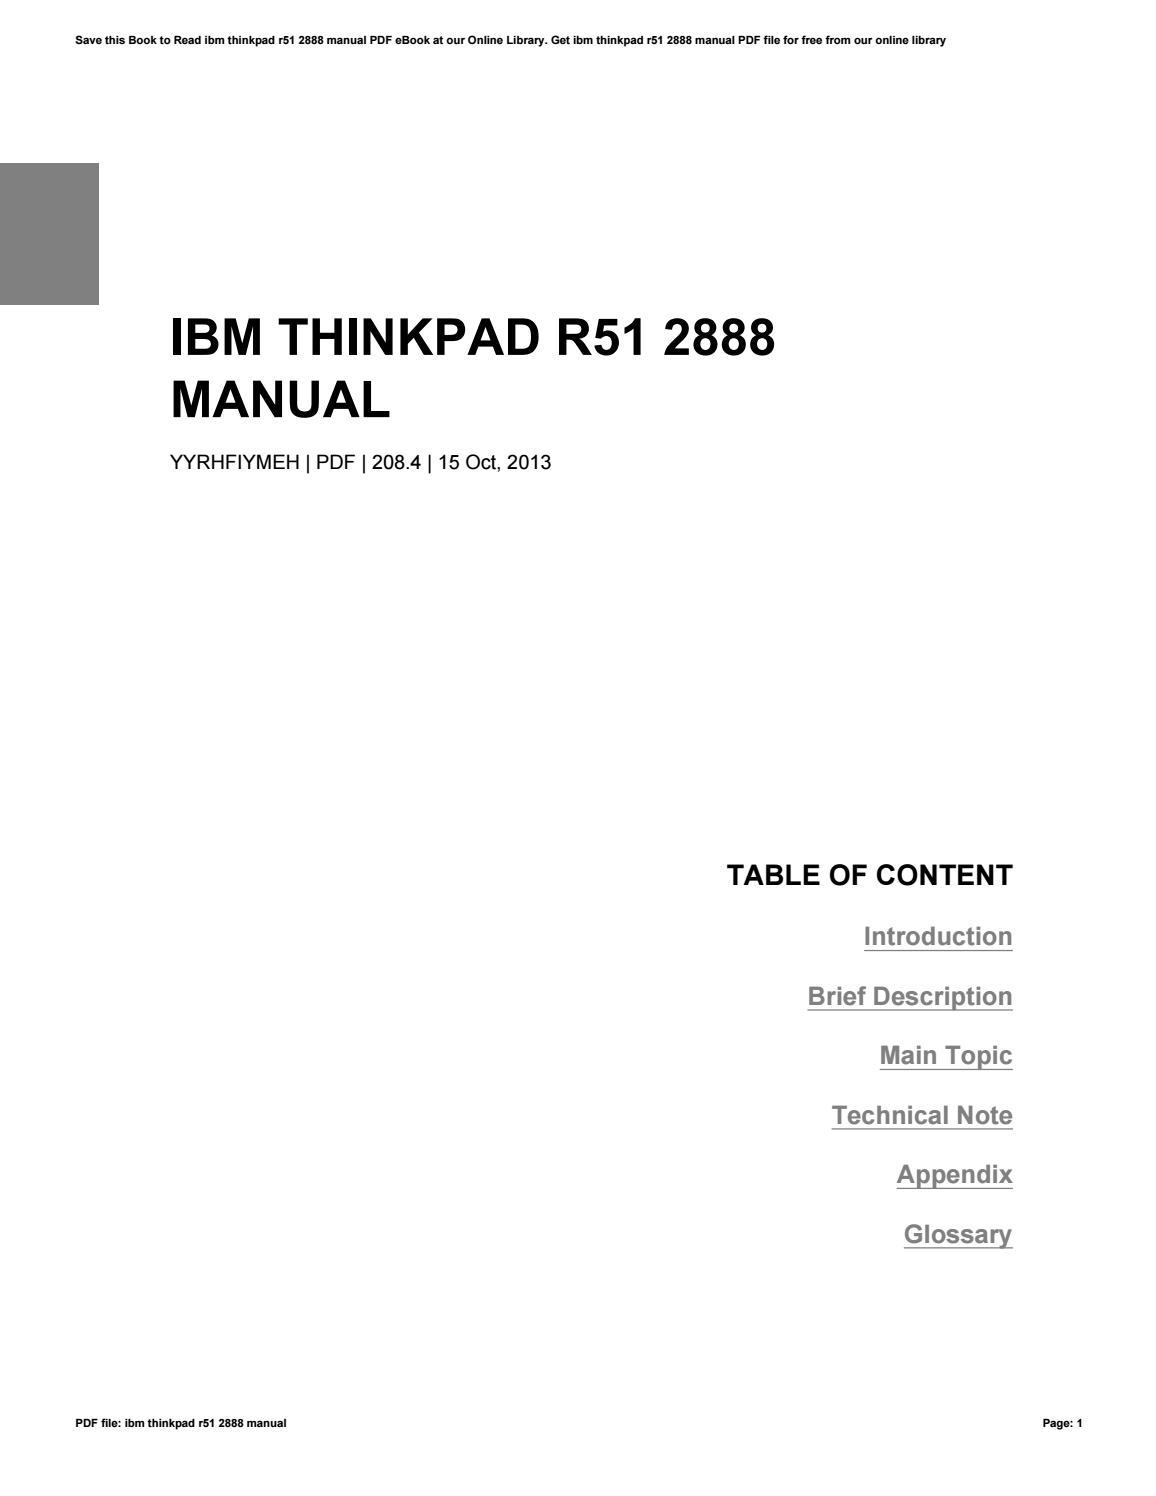 Ibm R51 Manual Ebook 19851995 Yamaha Moto4 200 225 250 350 Service Repair Array Thinkpad 2888 By Richardcarlile1325 Issuu Rh